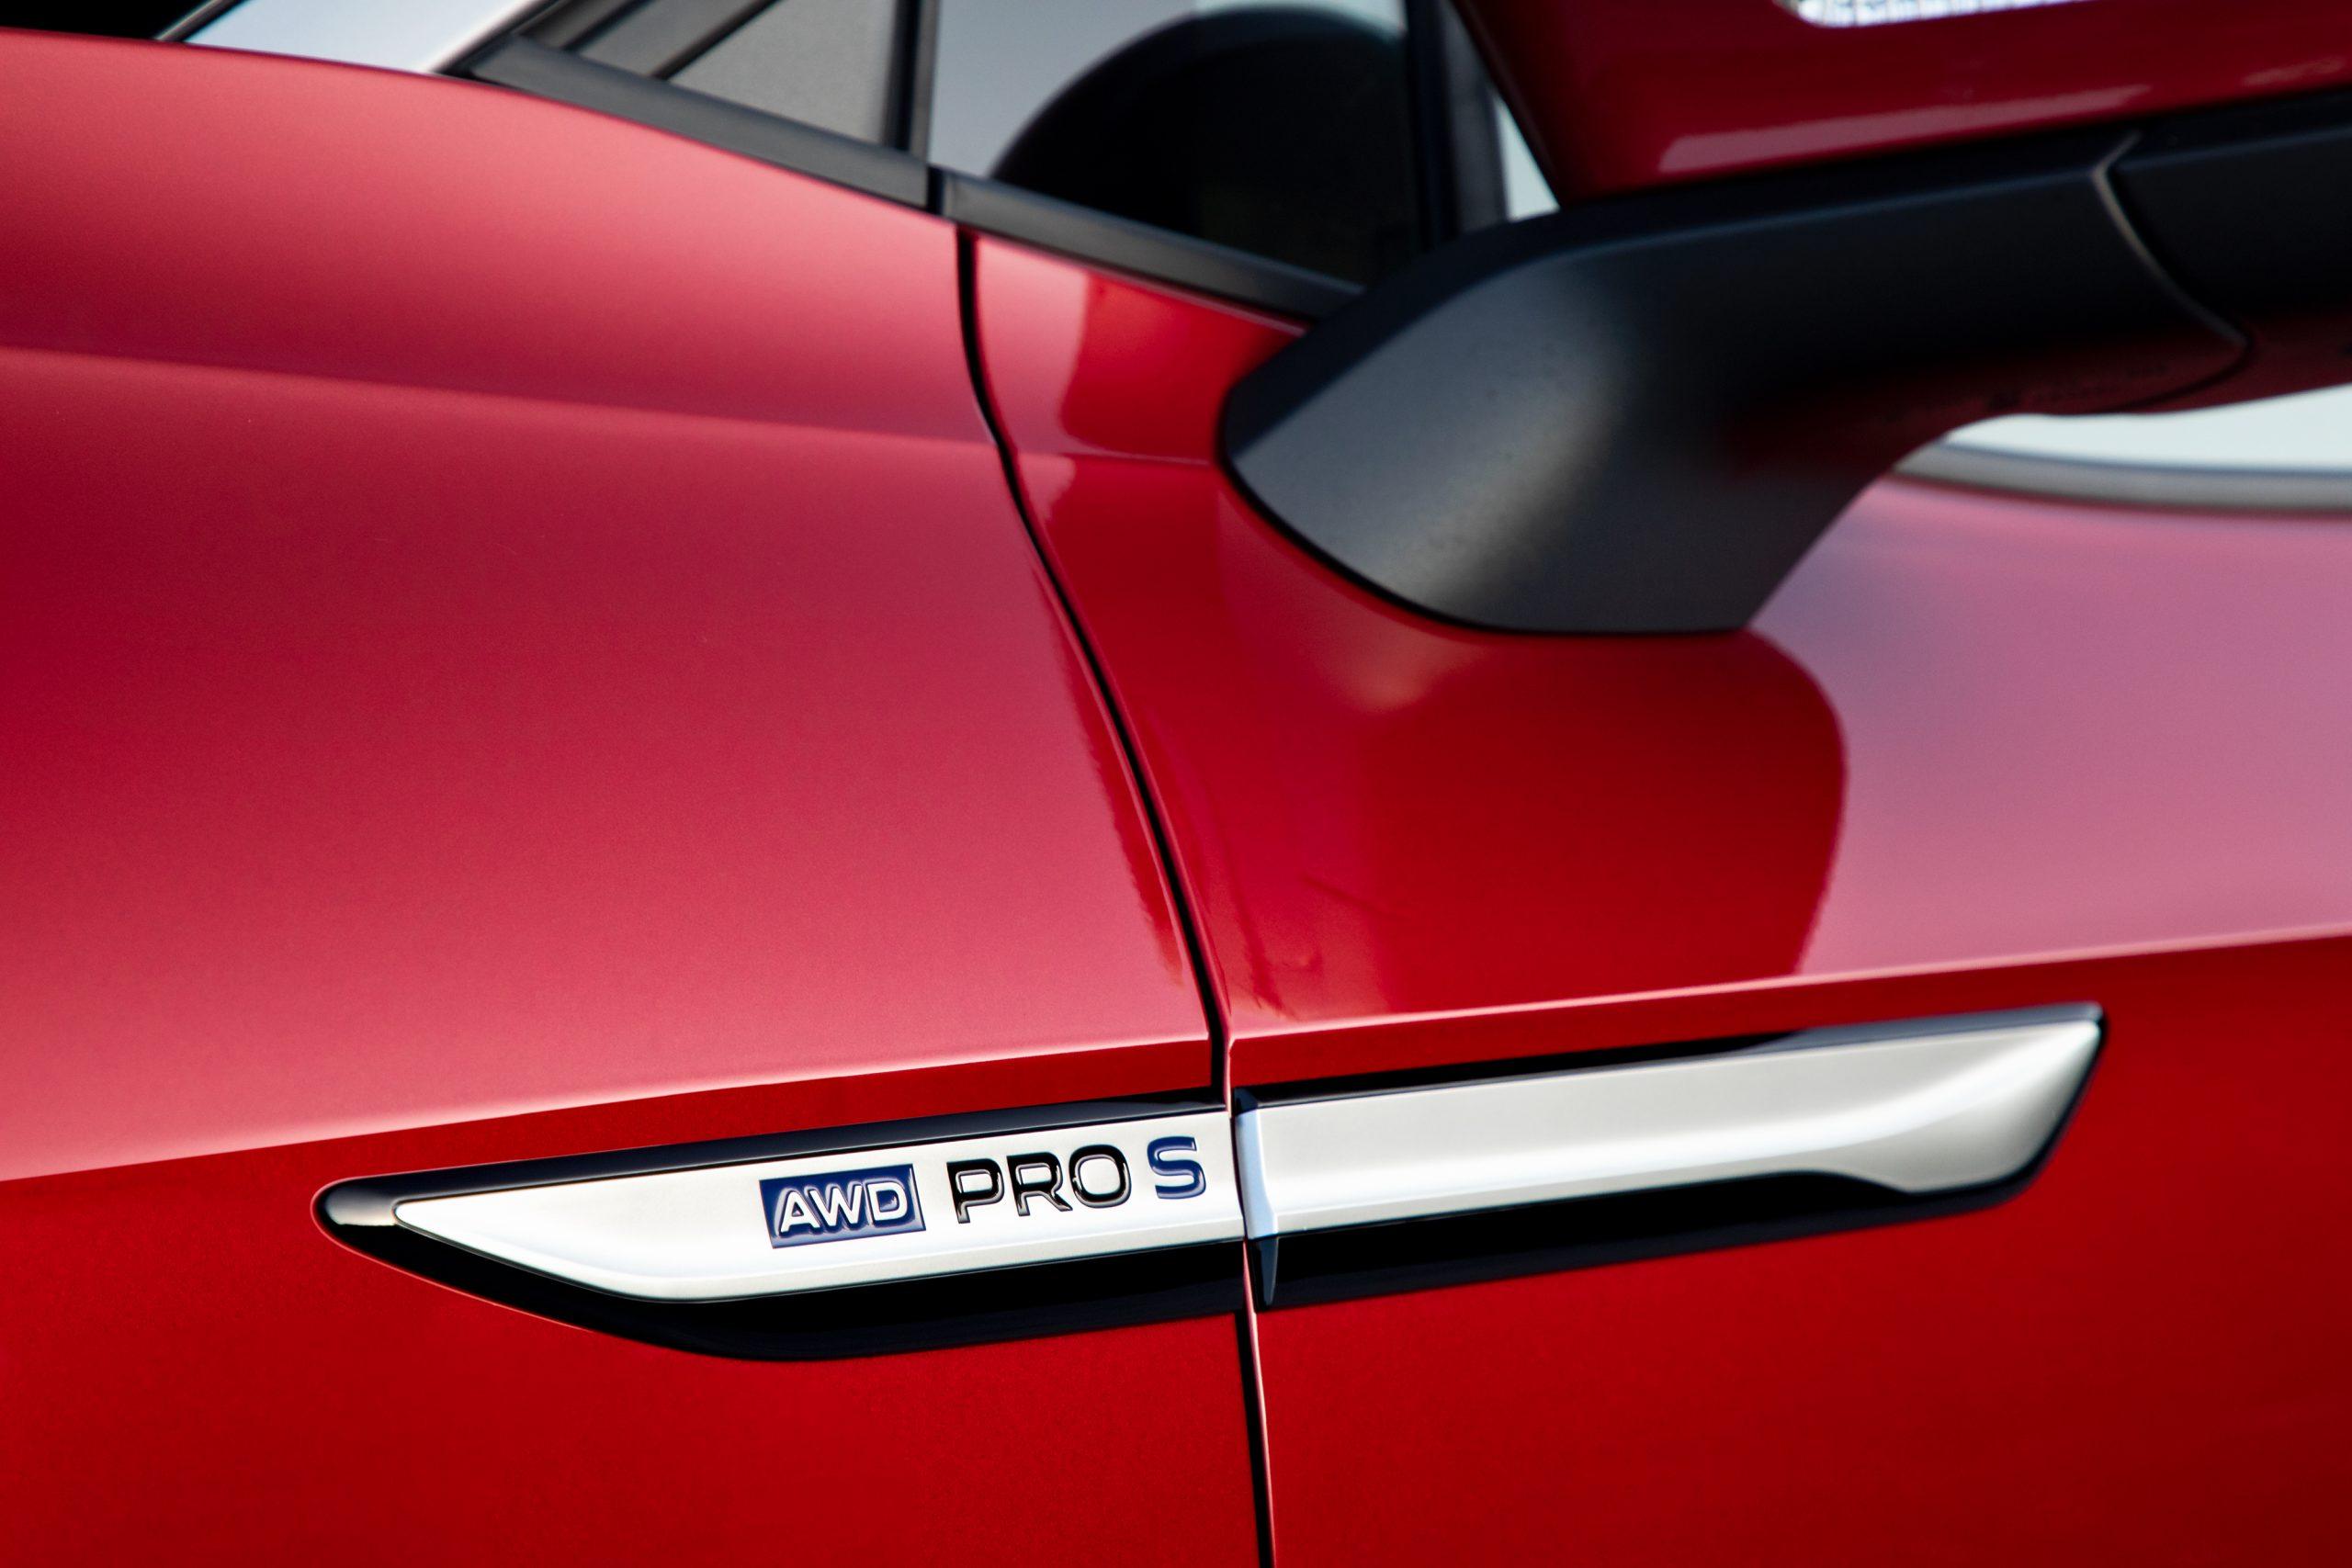 VW ID.4 AWD Pro S badge detail